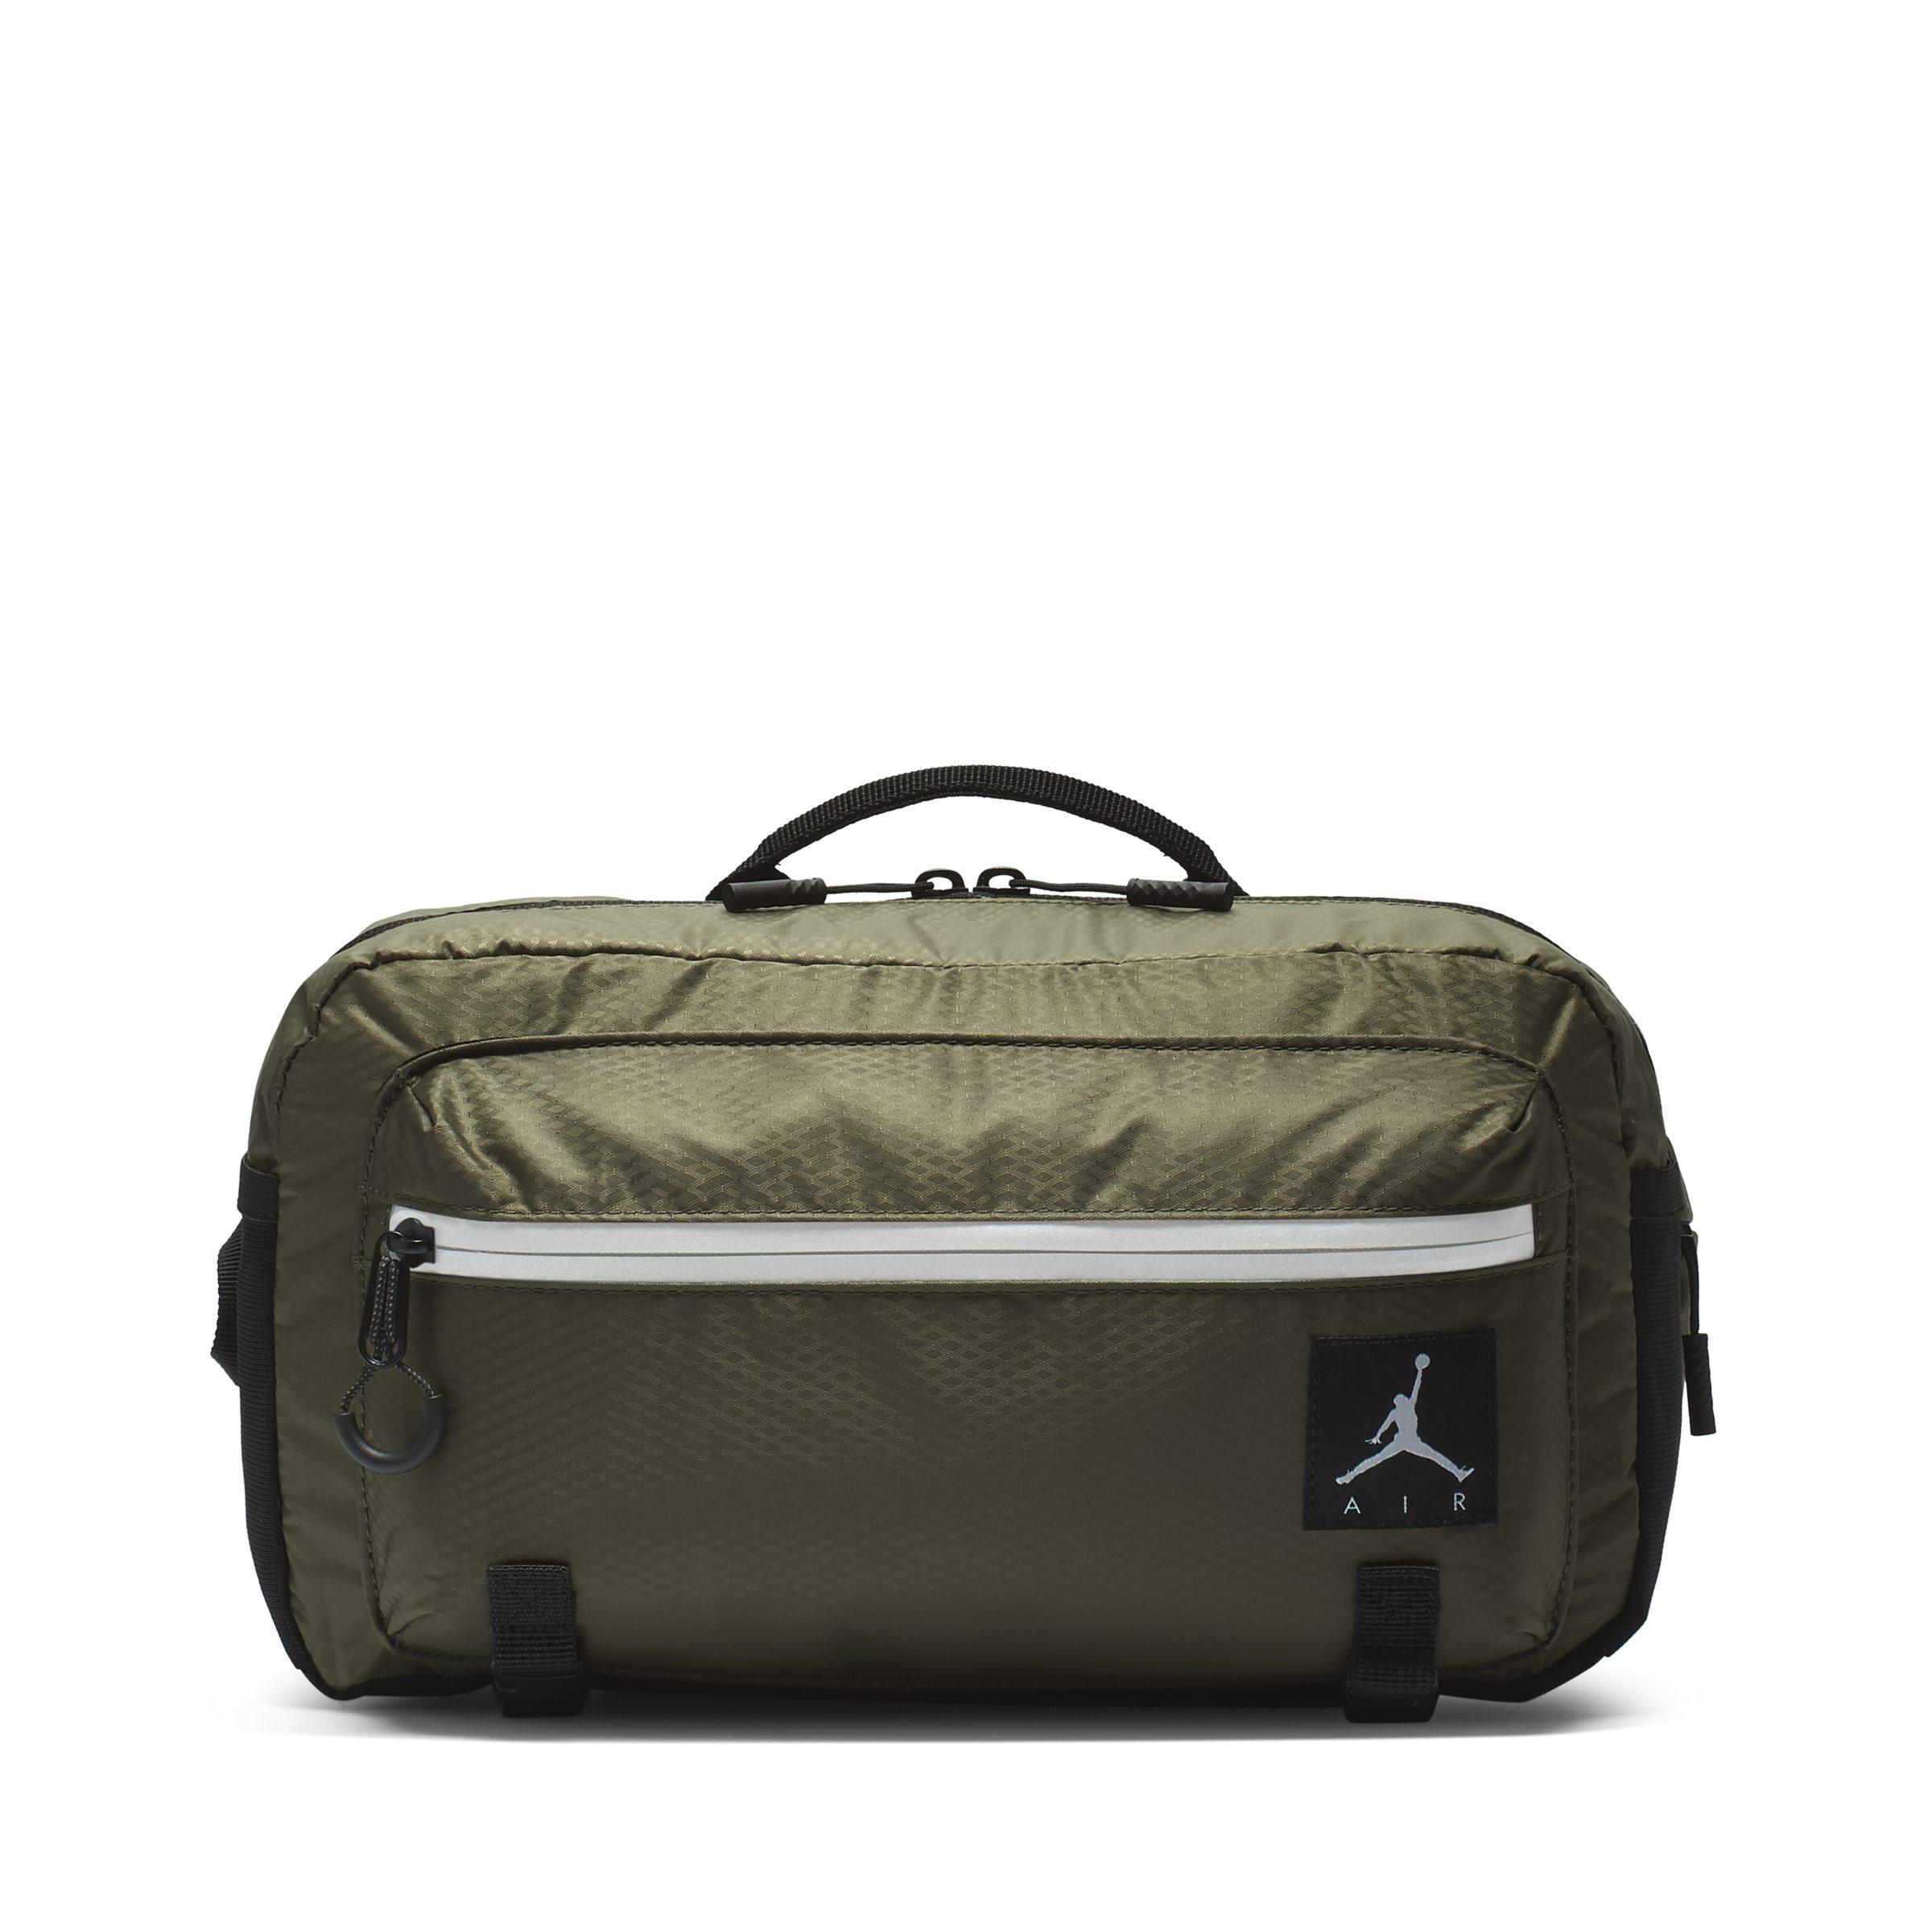 bca6e4935a Sac Air Jordan Crossbody Nike pour homme en coloris Vert - Lyst